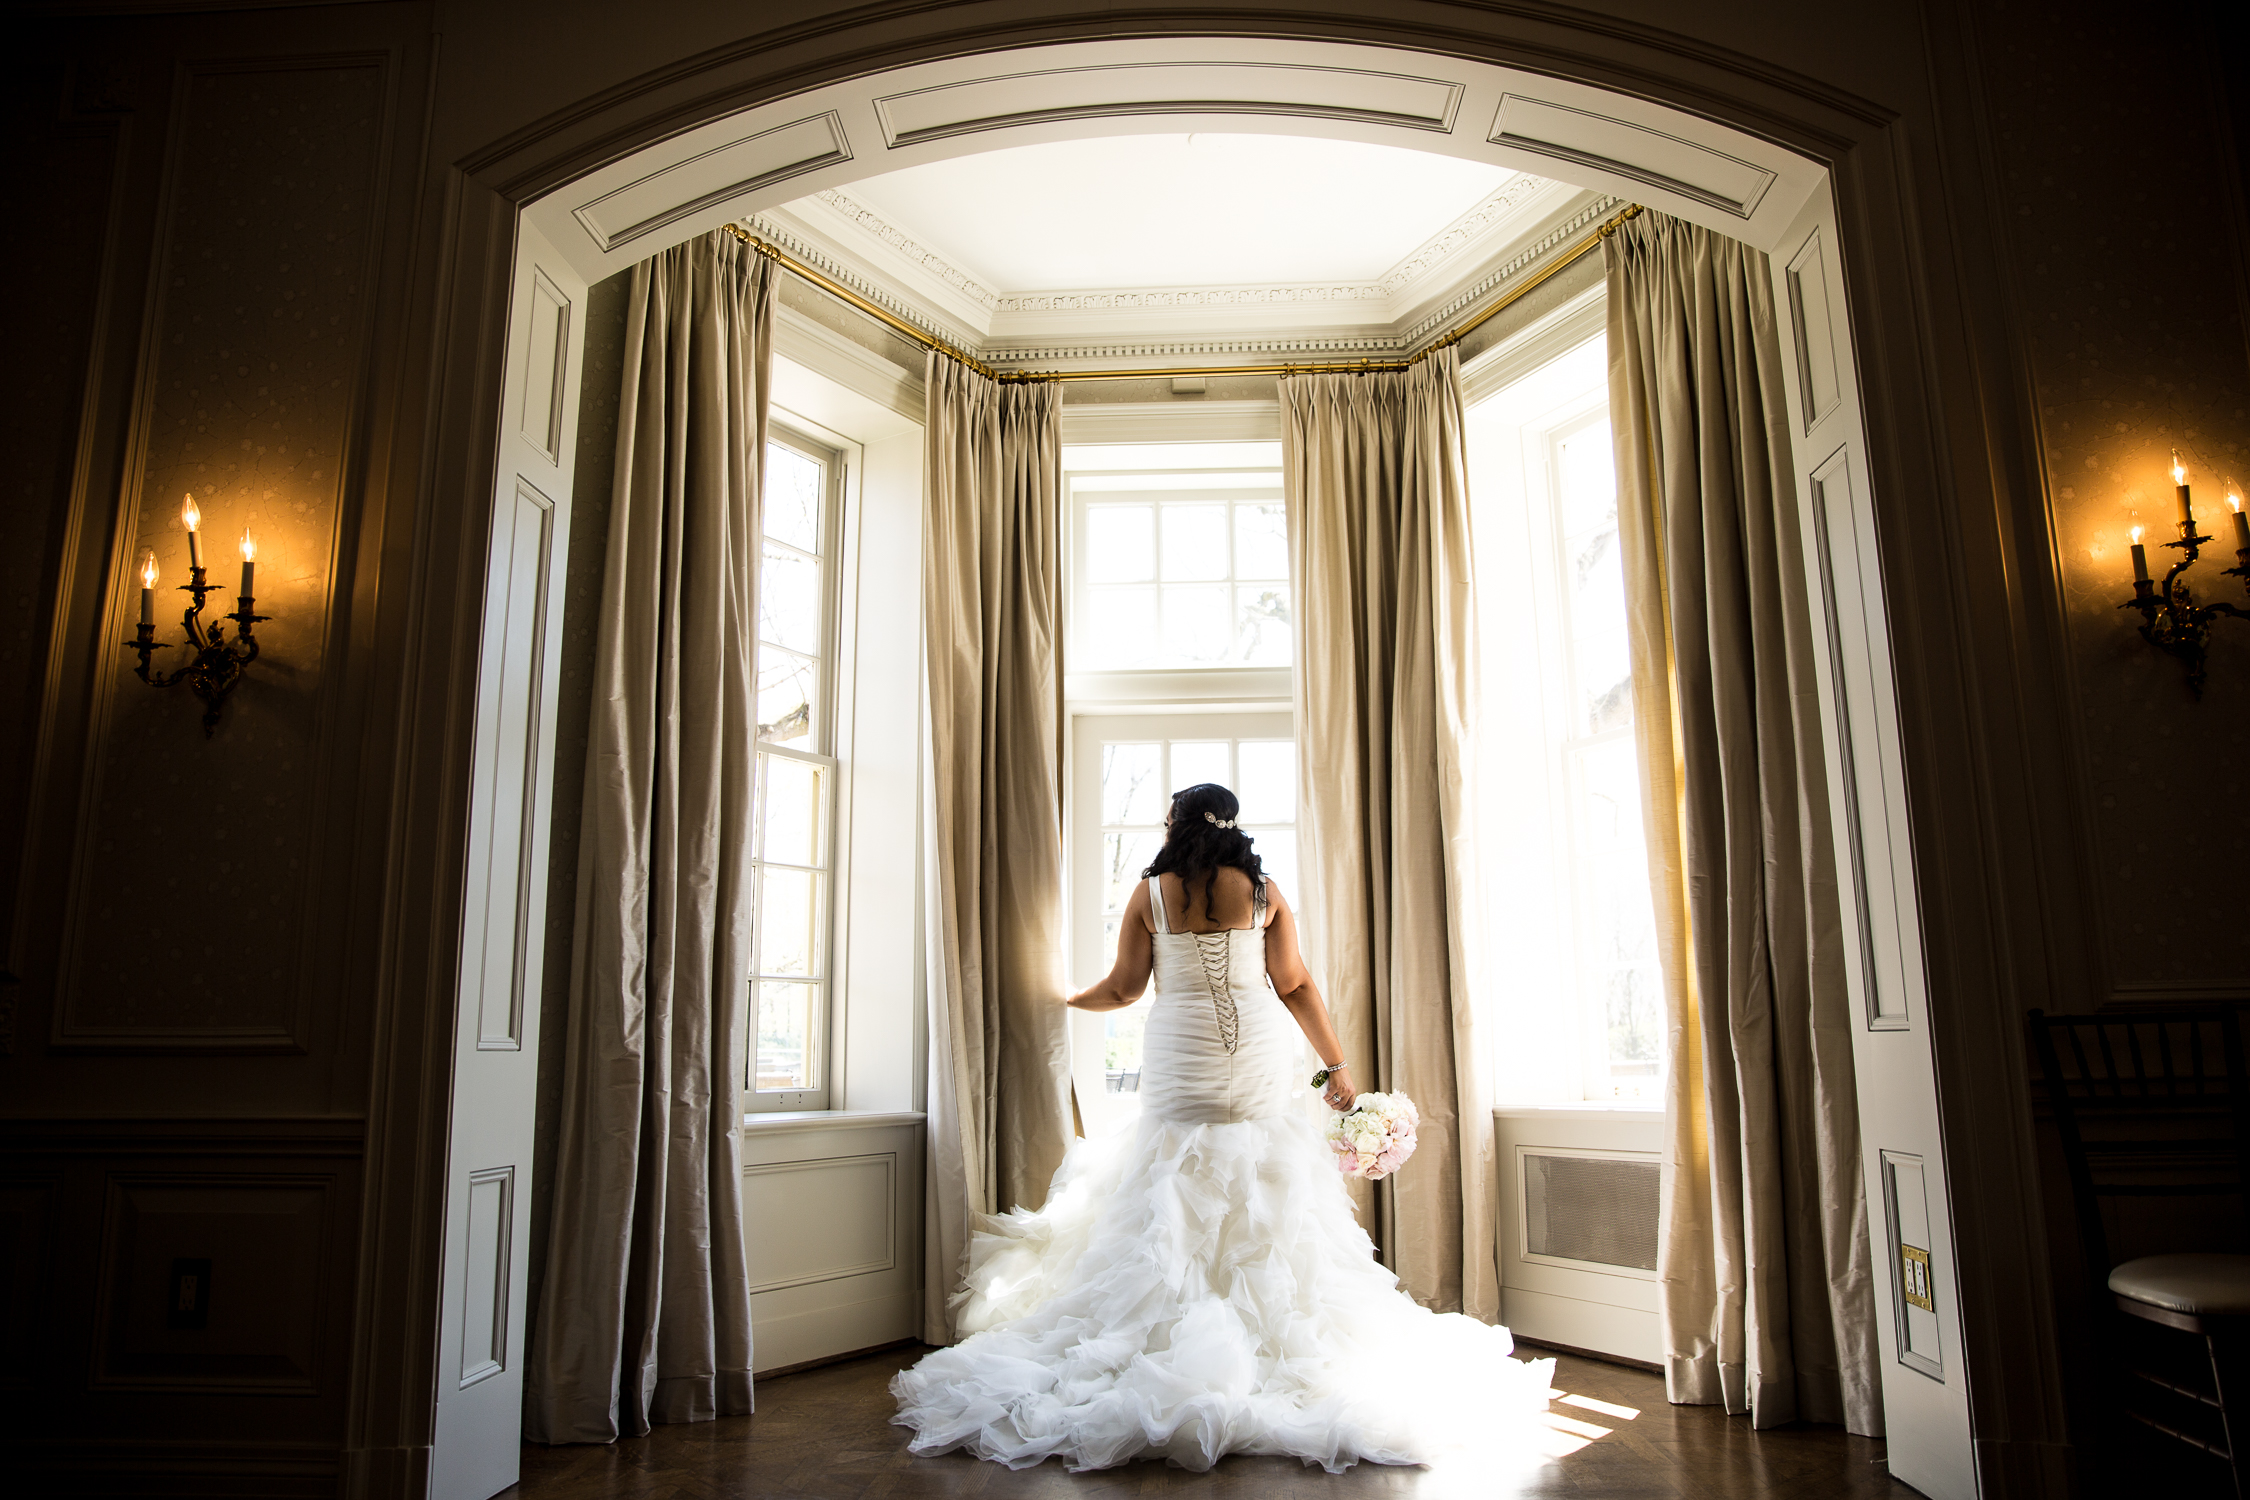 Peter-and-Marie-Wedding-Fontana-Primavera-Graydon-Hall-Manor-Toronto-Ontario-Canada-0017.jpg